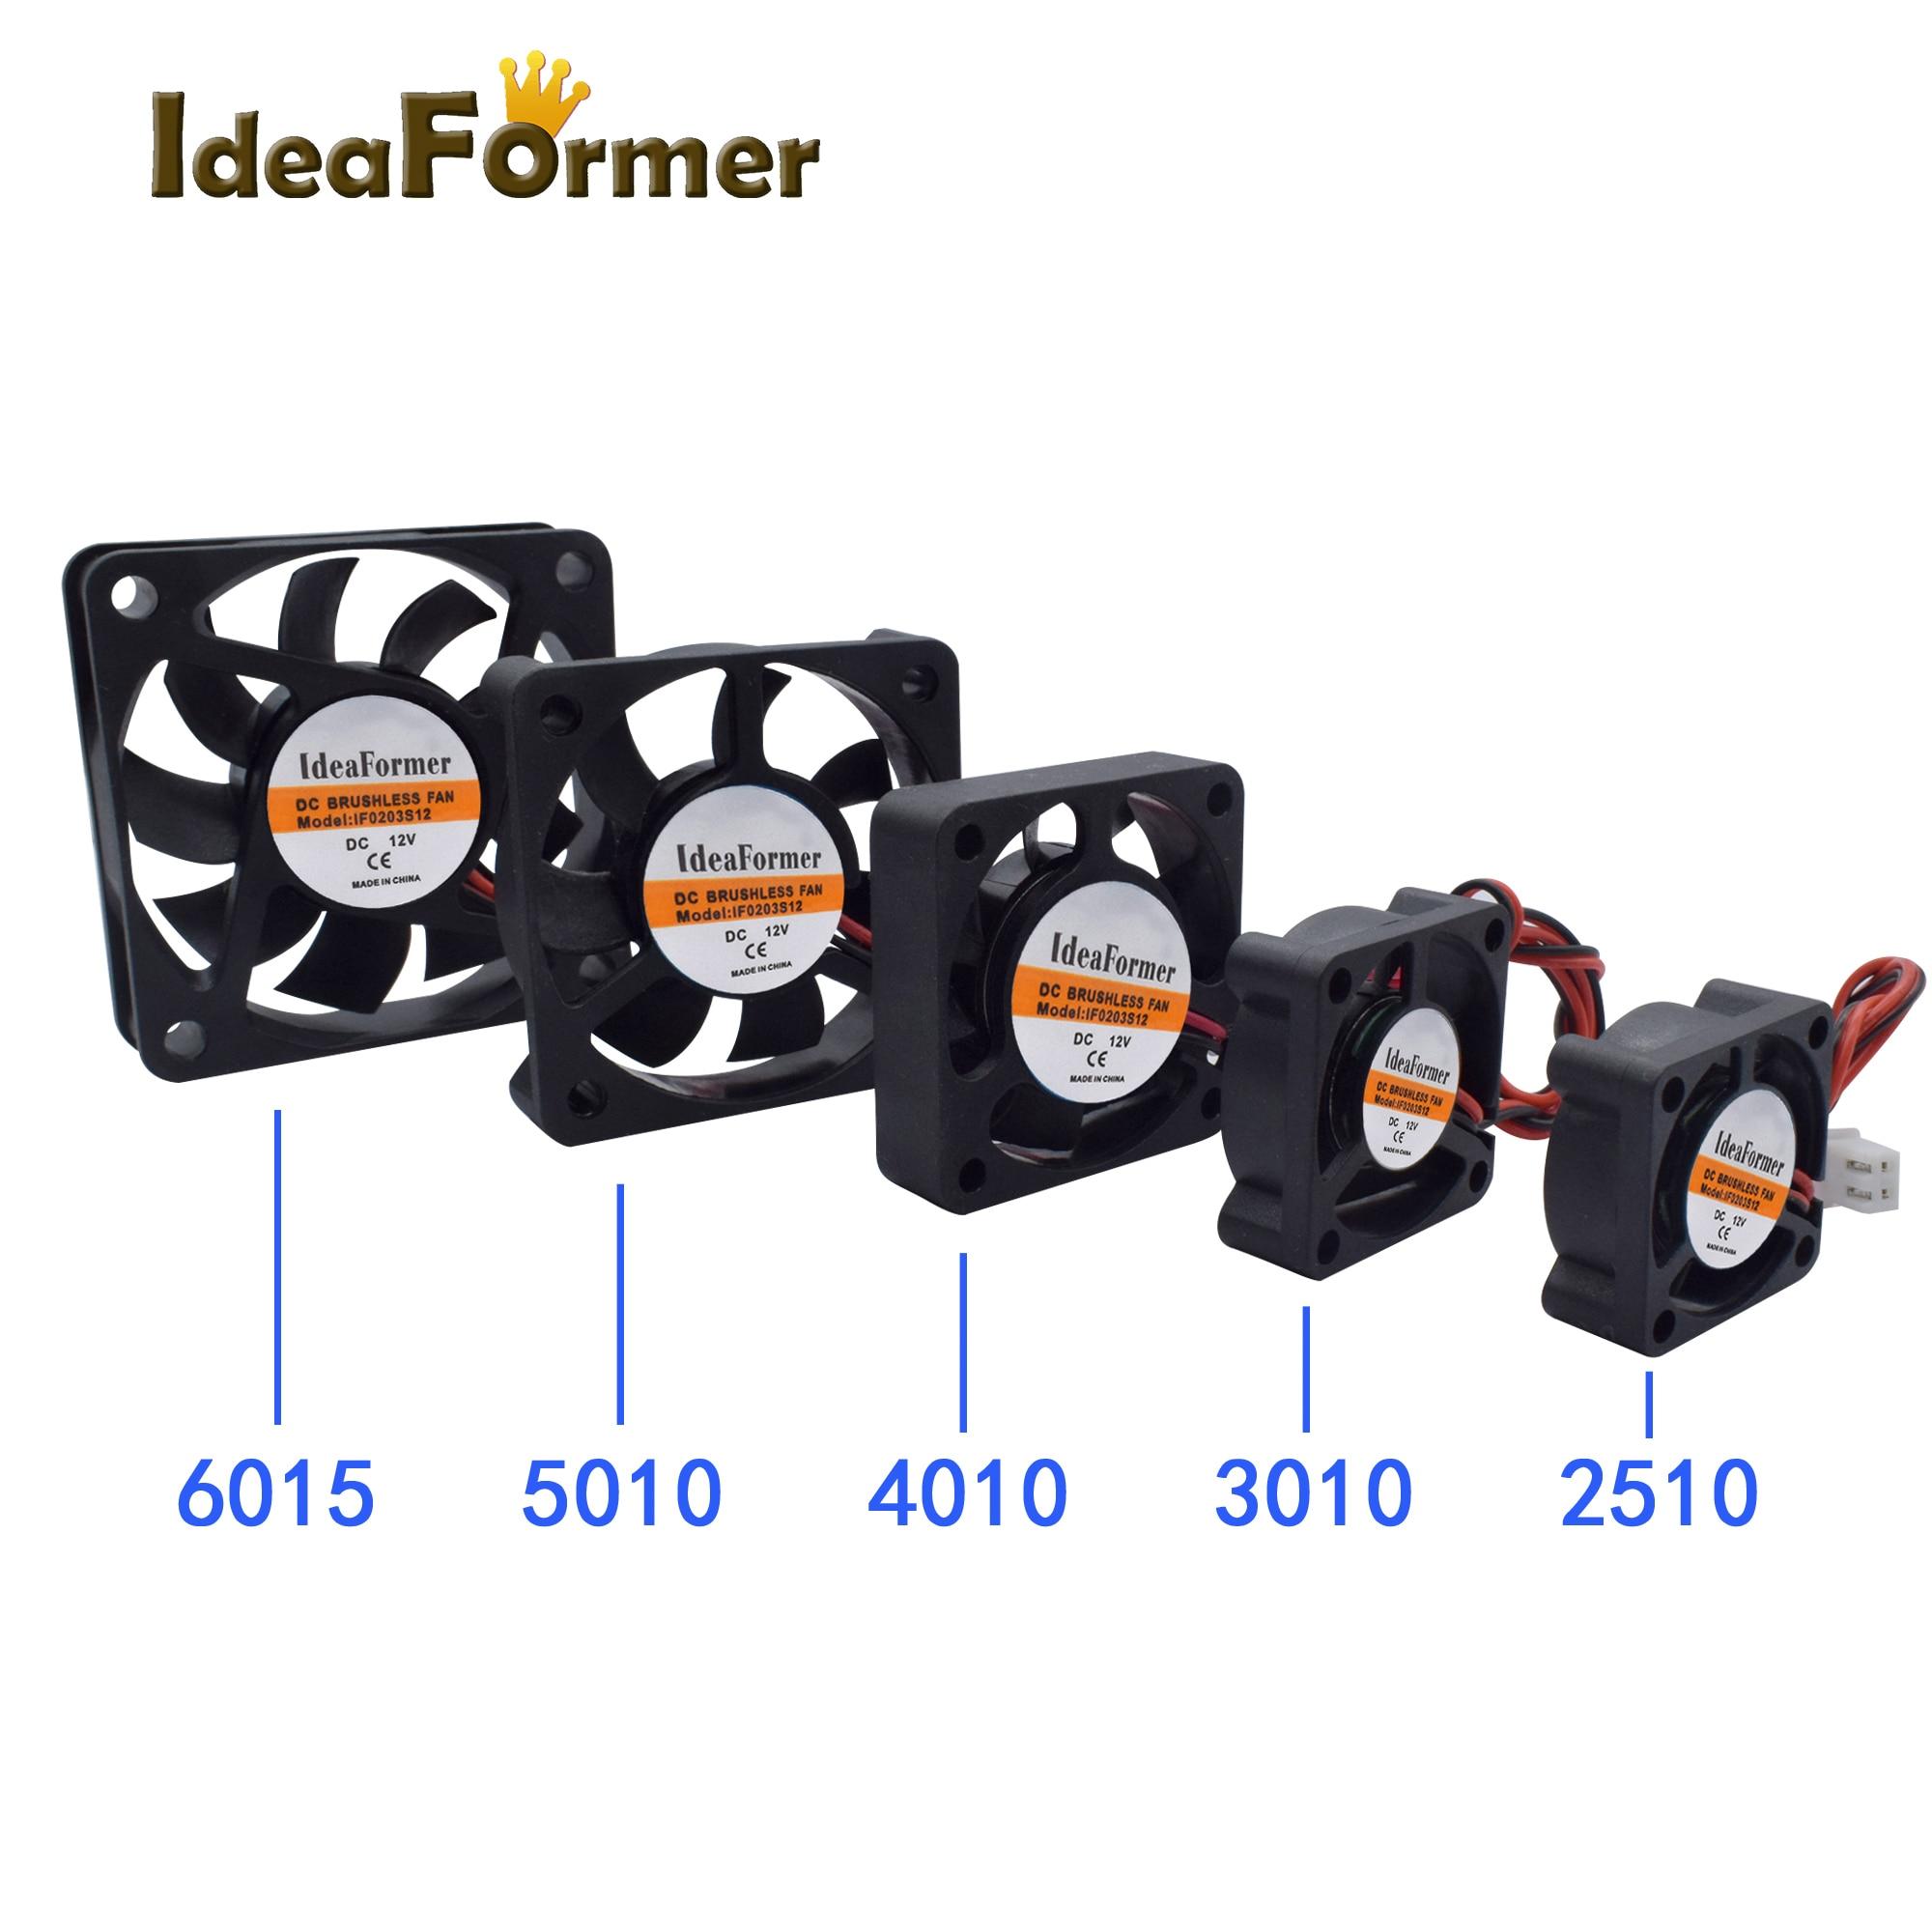 3D Printer Parts 2510/3010/4010/5010/6015mm 3D Printer Extruder Cooler Fan DC 5/12/24V With 2Pin Dupont Wire Black Plastic